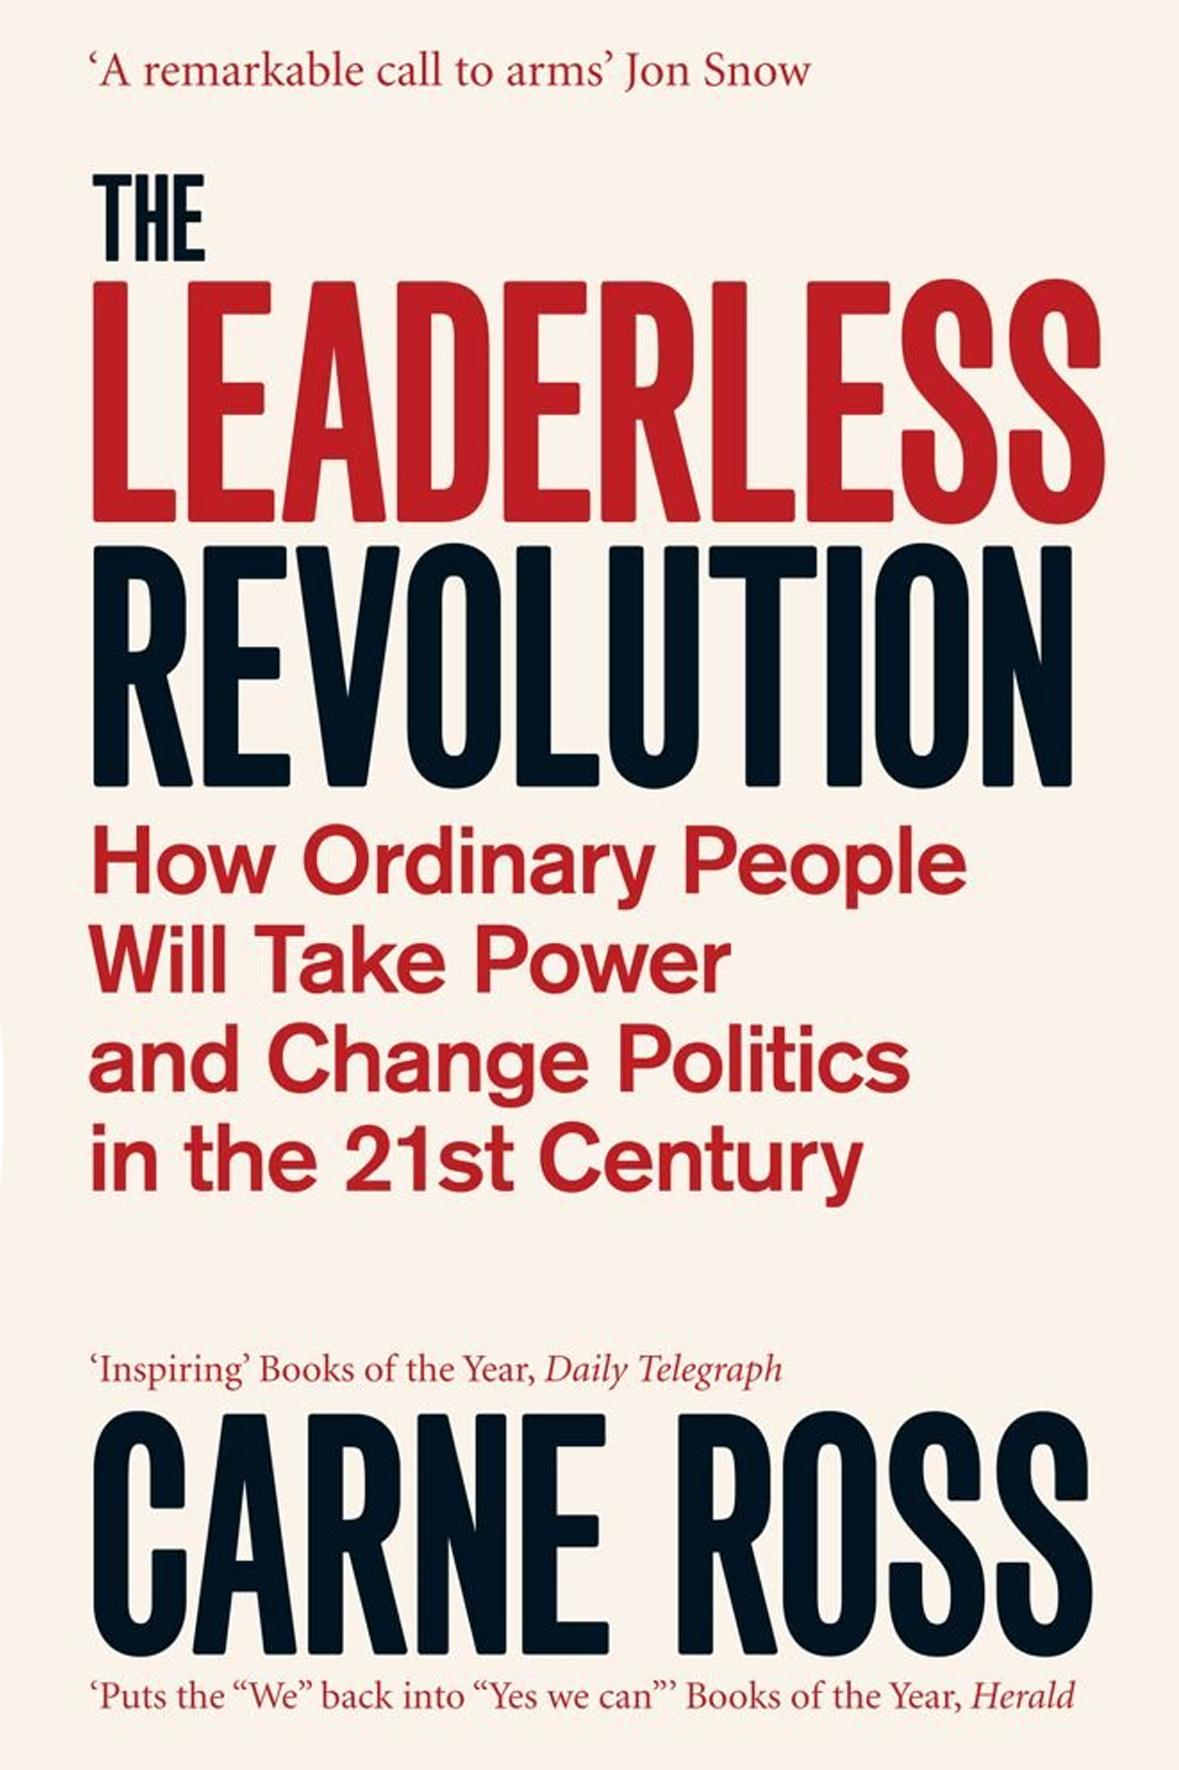 The Leaderless Revolution | Review